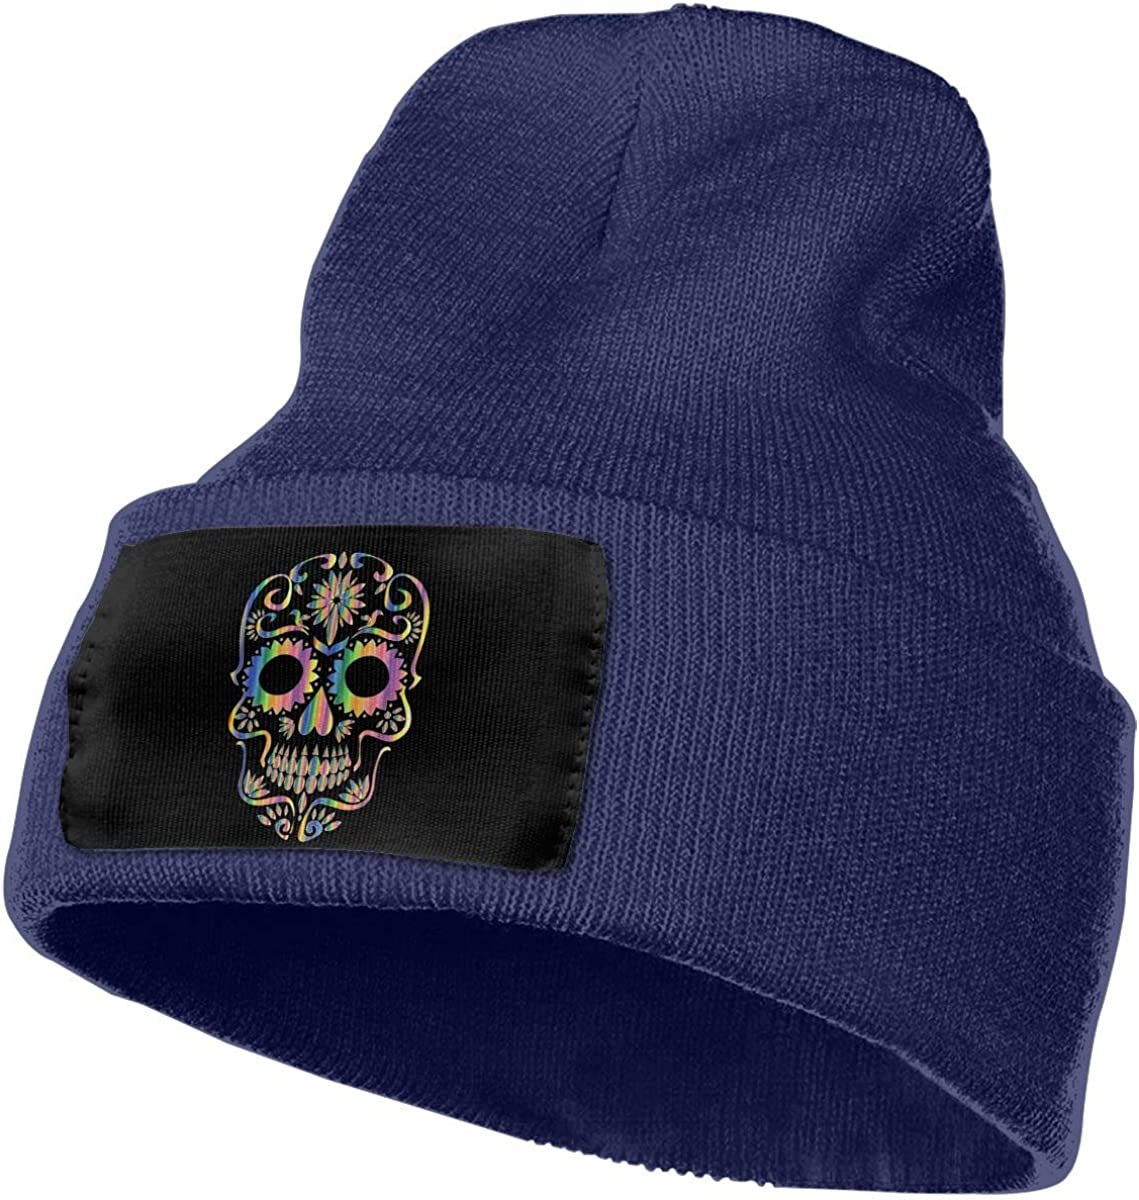 Unisex 100/% Acrylic Knitting Hat Cap Psychedelic Sugar Skull Silhouette Original Ski Cap